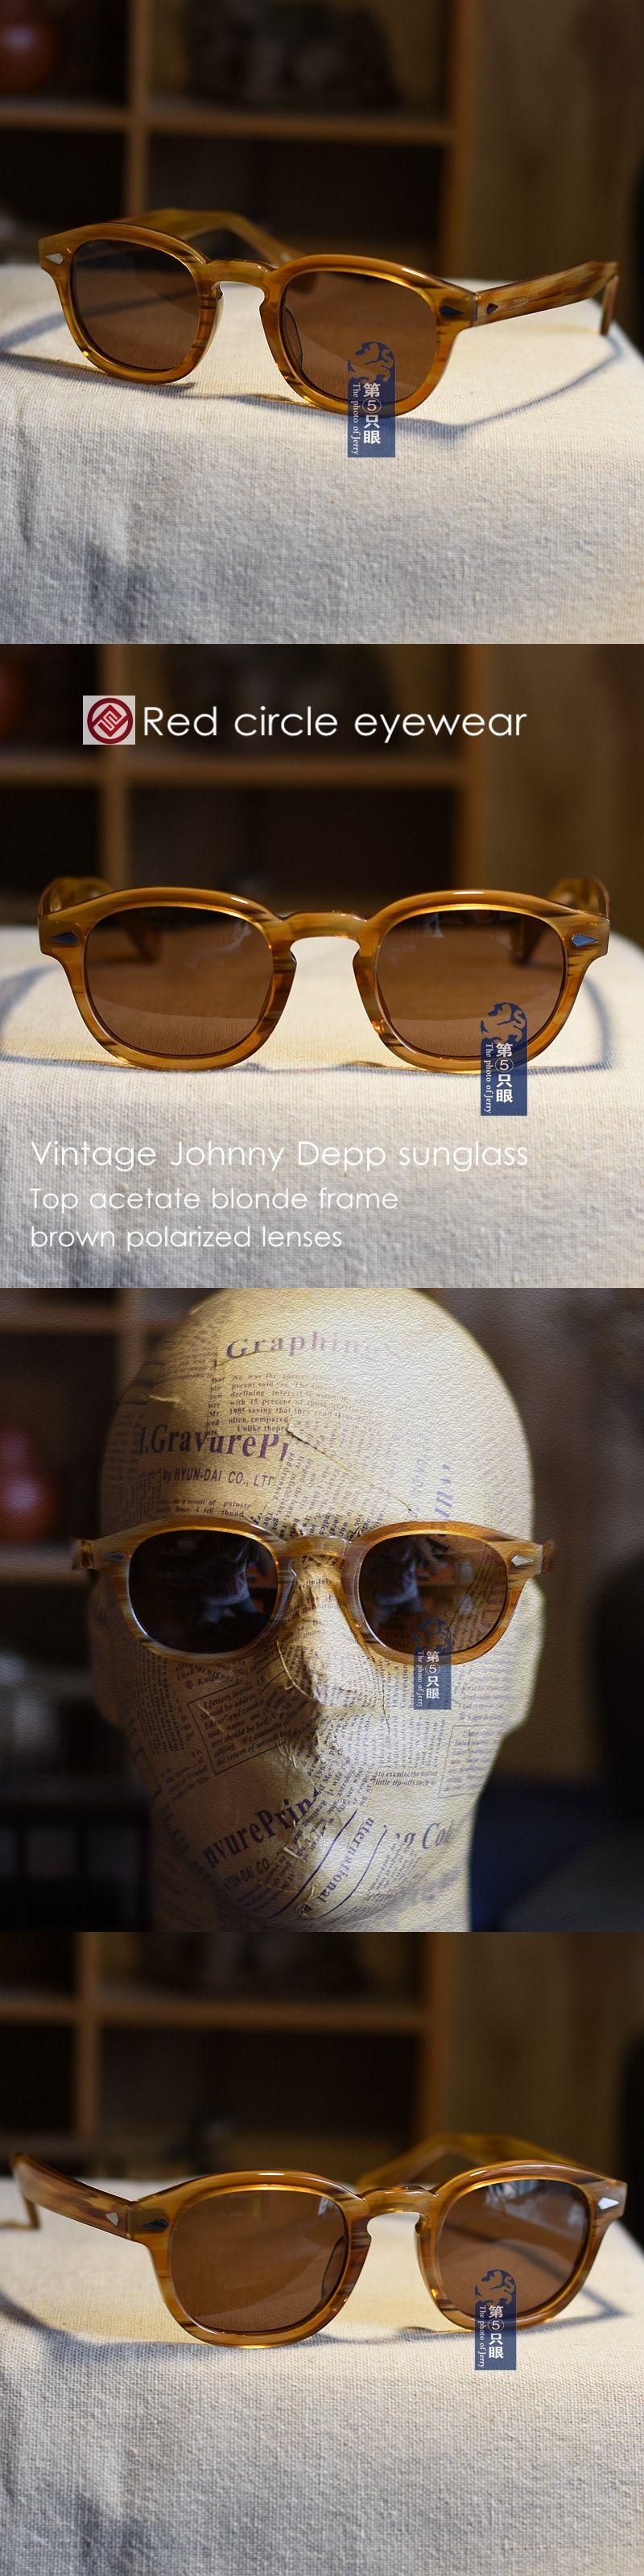 093cbae7c8 Sunglasses 48559  46Mm Vintage Polarized Sunglasses Johnny Depp Eyeglasses  Mens Blonde Brown Lens -  BUY IT NOW ONLY   56.99 on eBay!